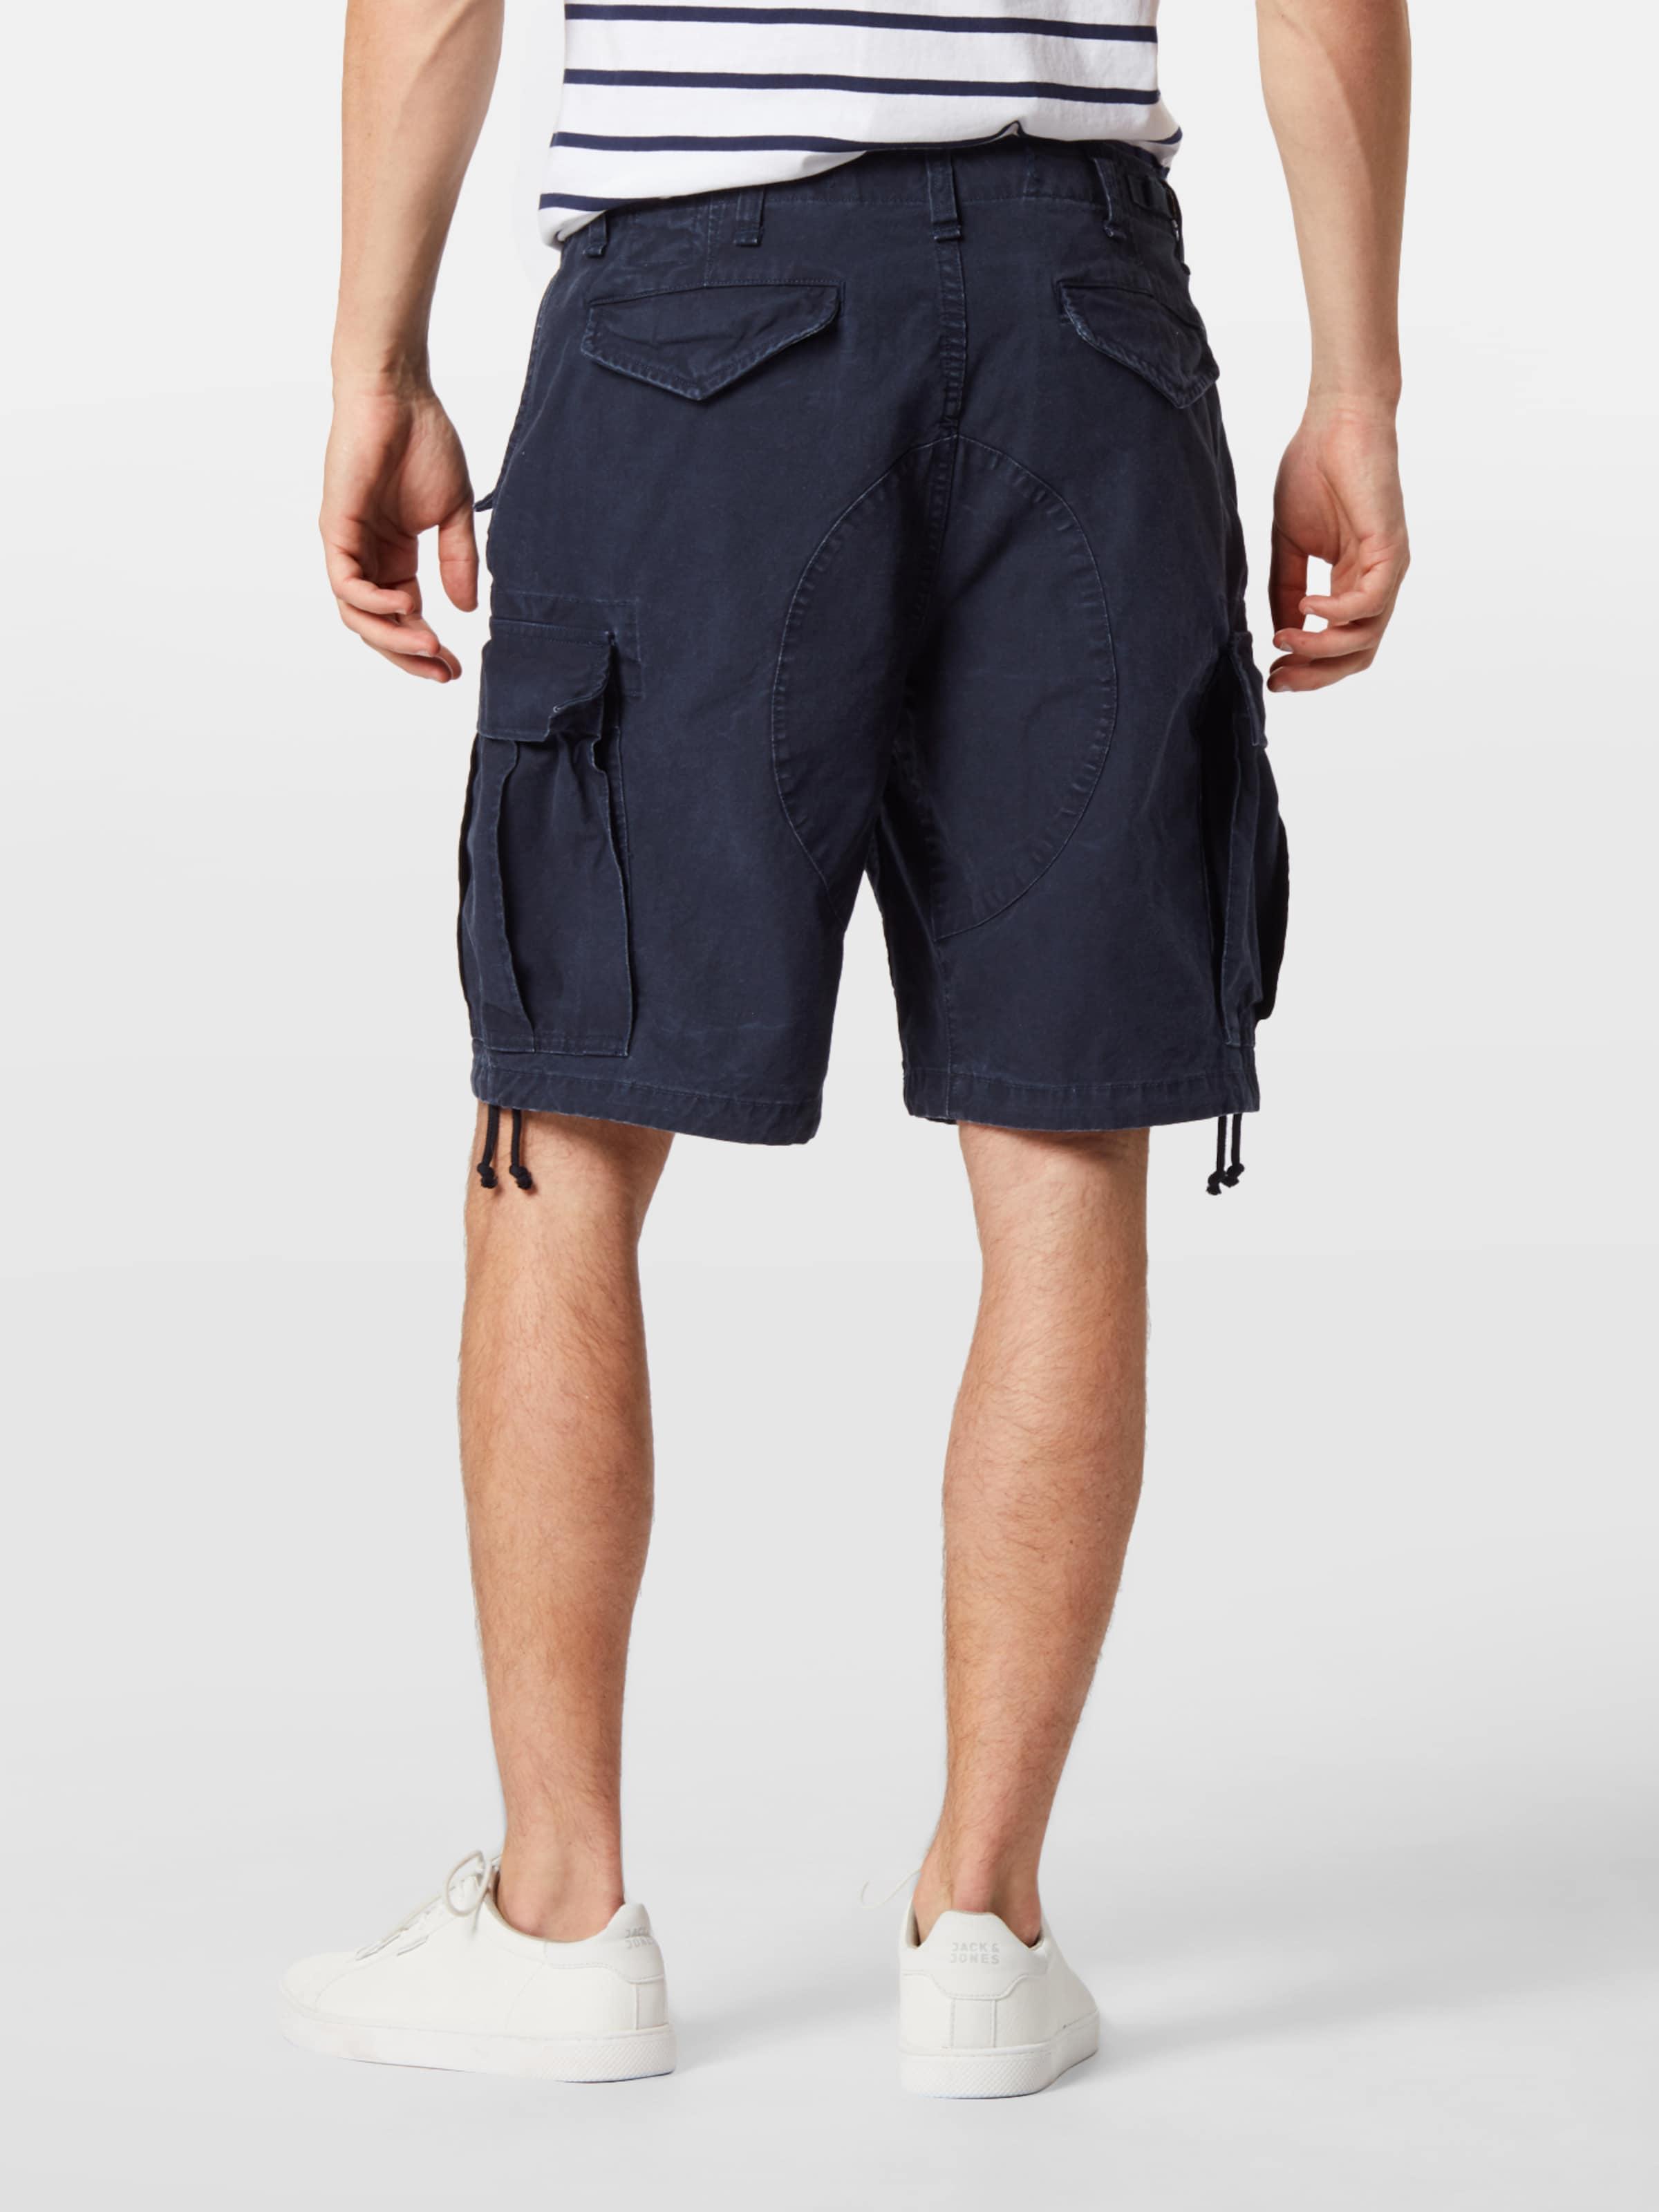 'cfm45s In Lauren Shorts Ralph Polo short' Navy b6gyfYv7